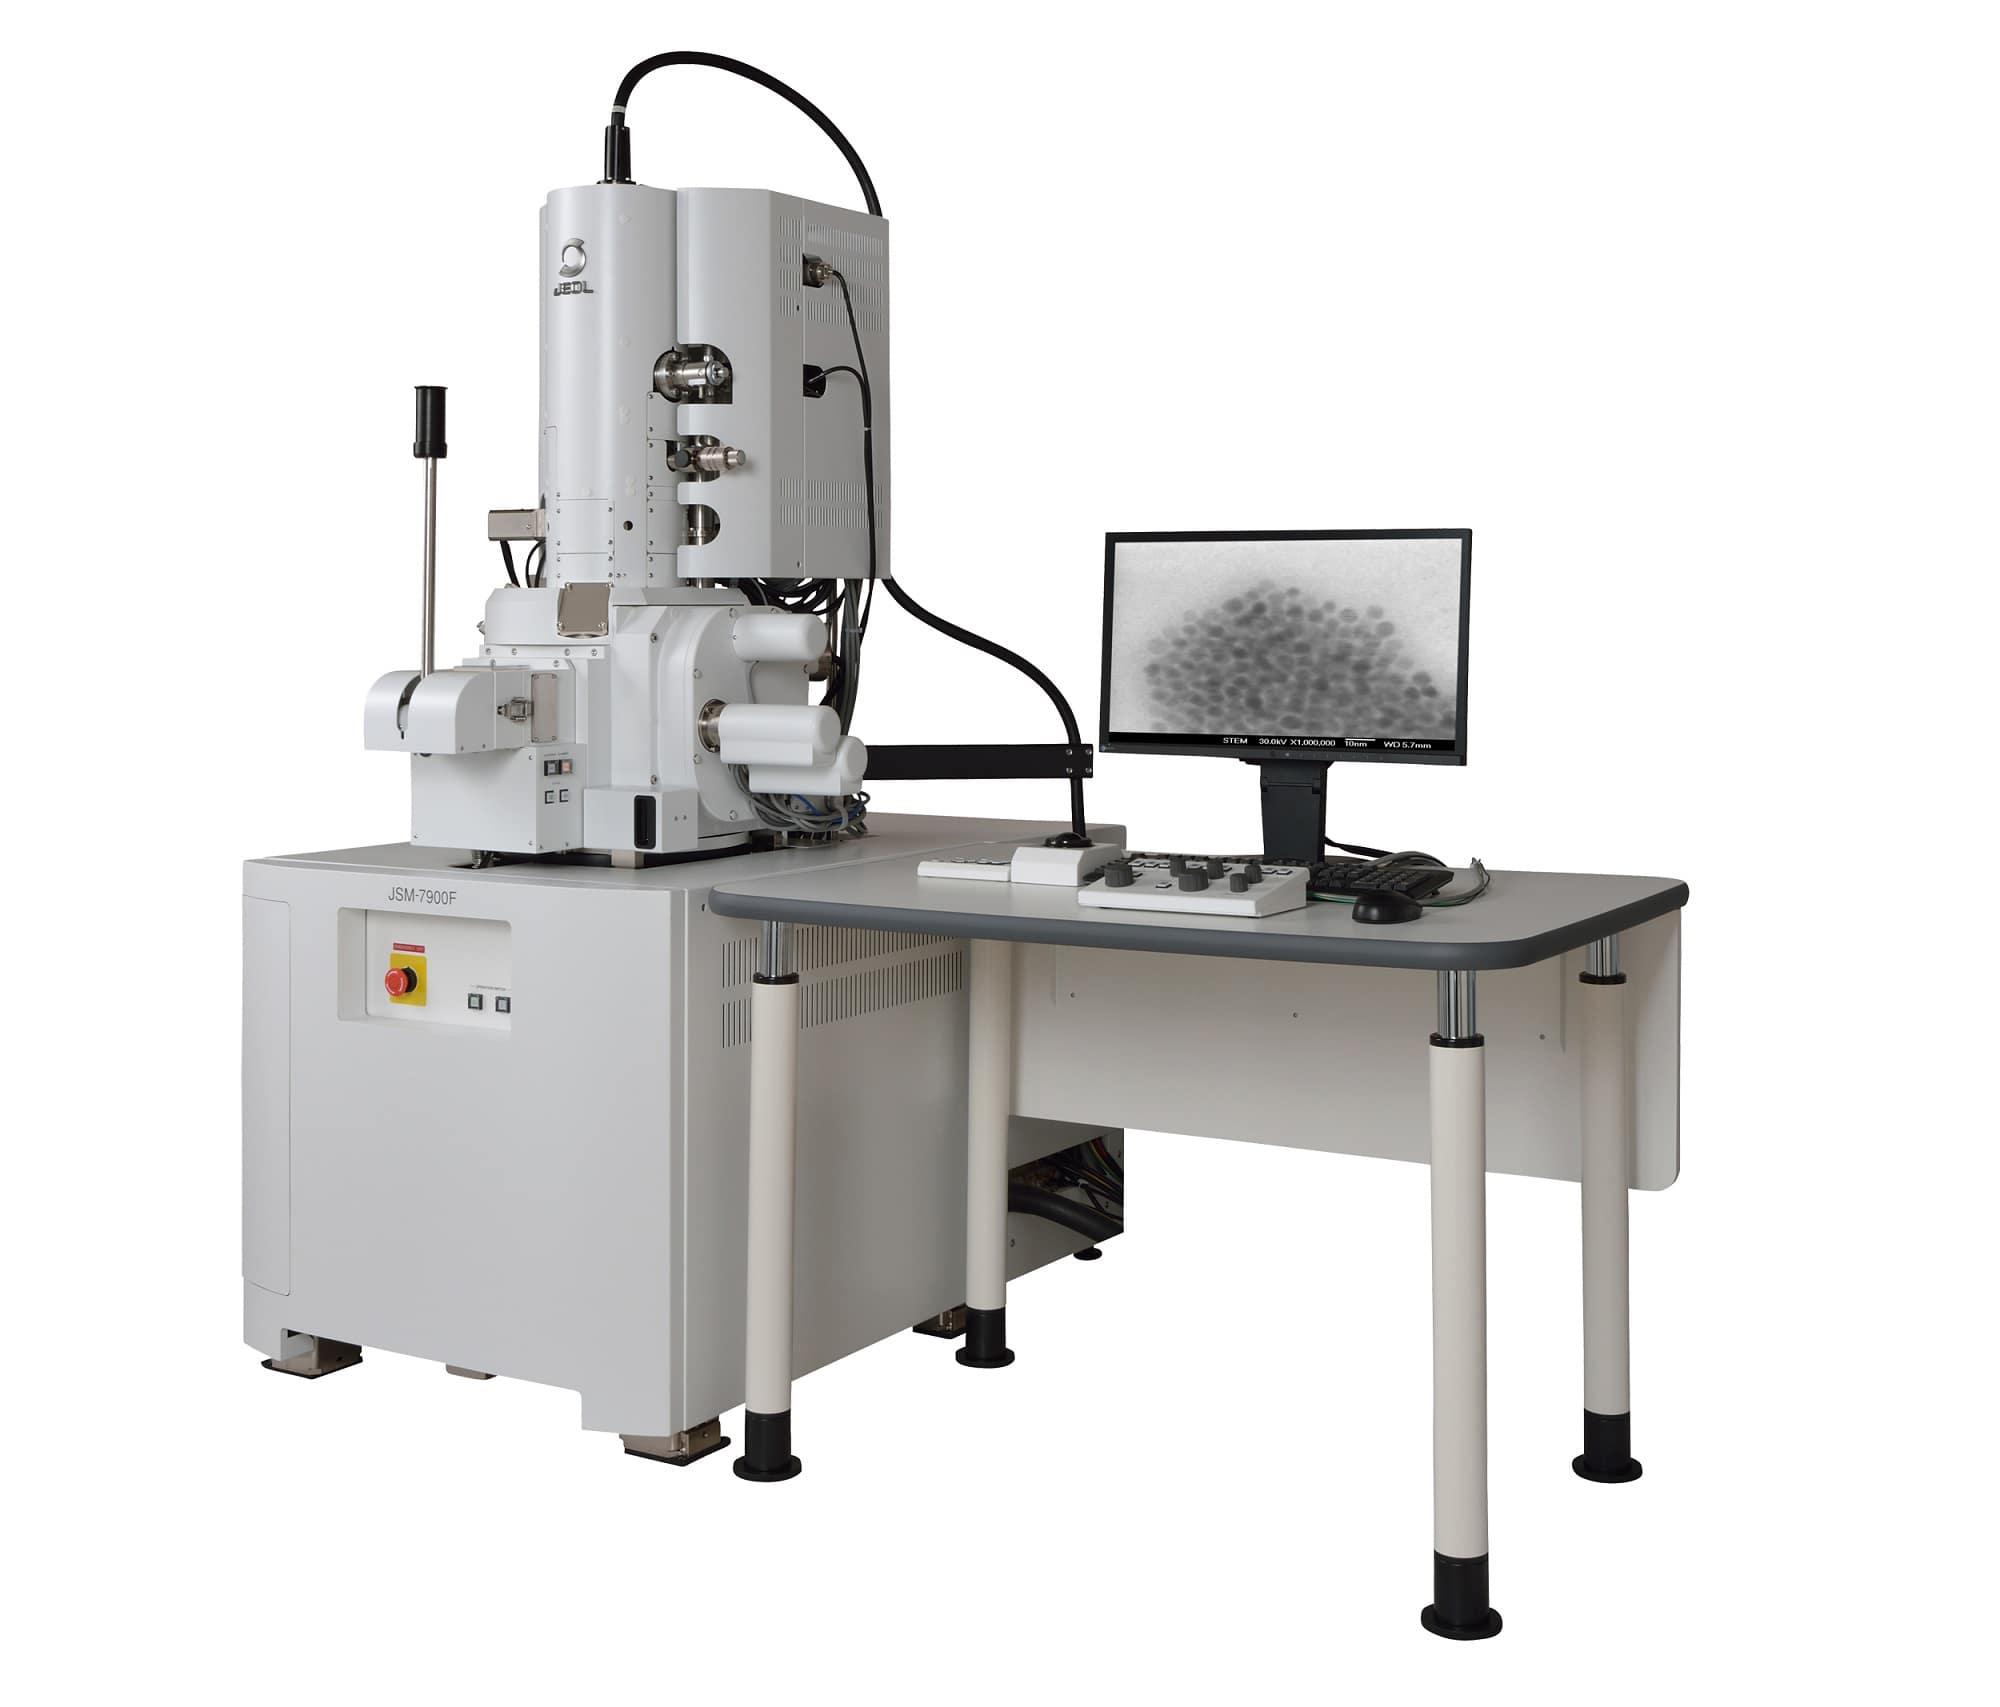 JSM-7900F Schottky Field Emission Scanning Electron Microscope (FESEM) Electron Microscope